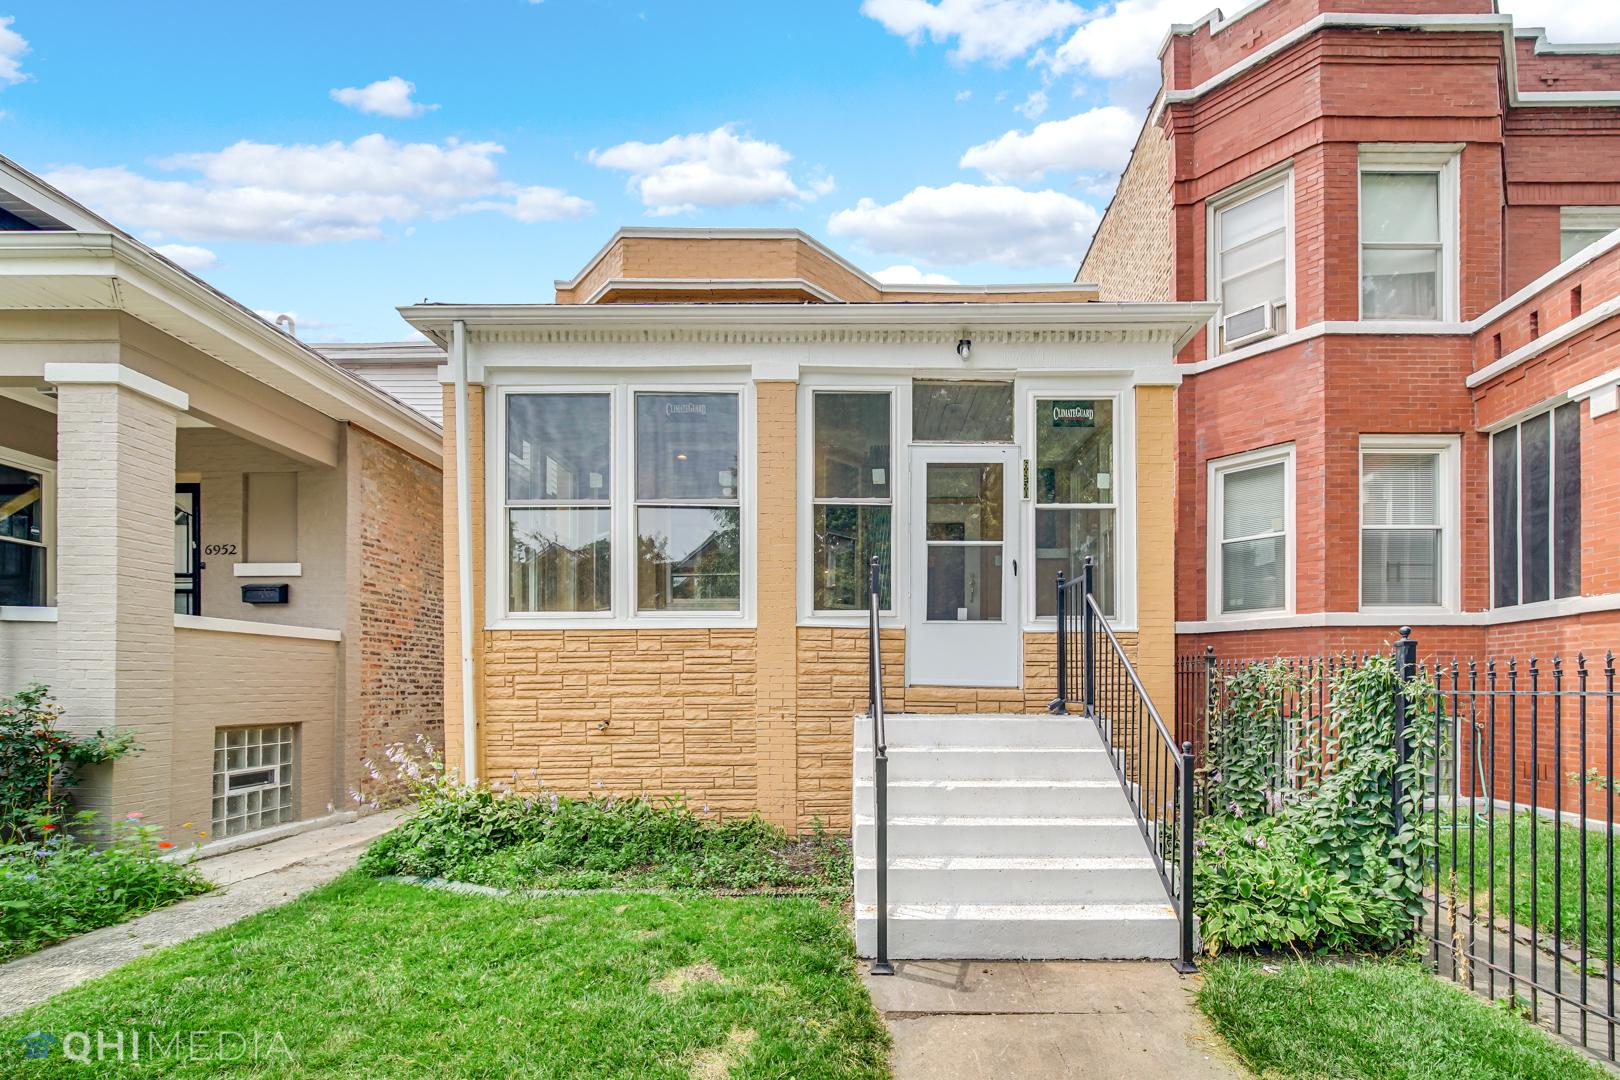 6950 S Prairie Avenue, Chicago IL 60637